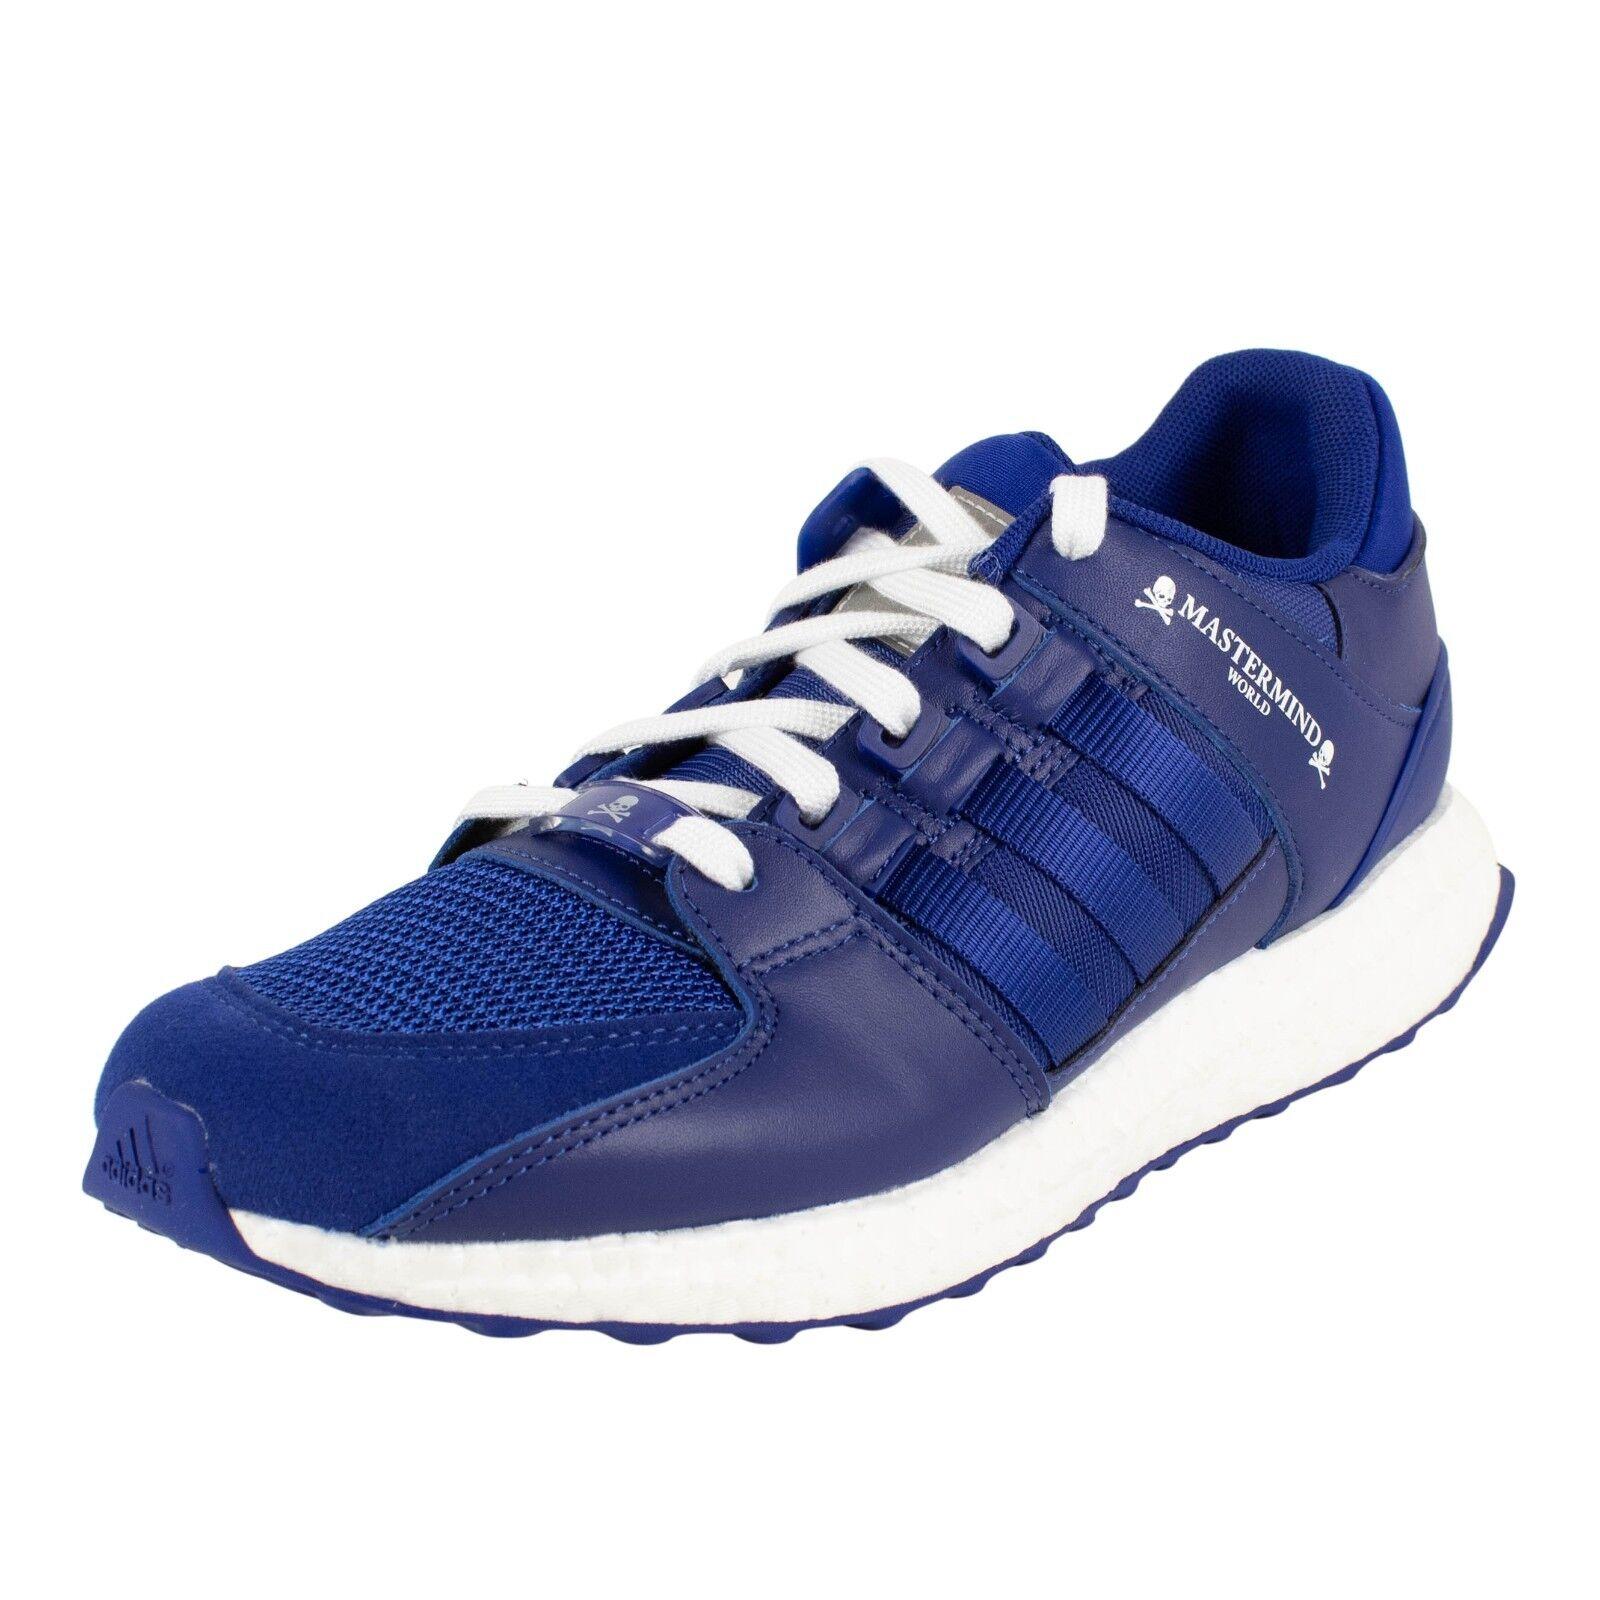 NIB MASTERMIND X ADIDAS EQT Support Ultra MMW Core Blue  Shoes 10.5  200